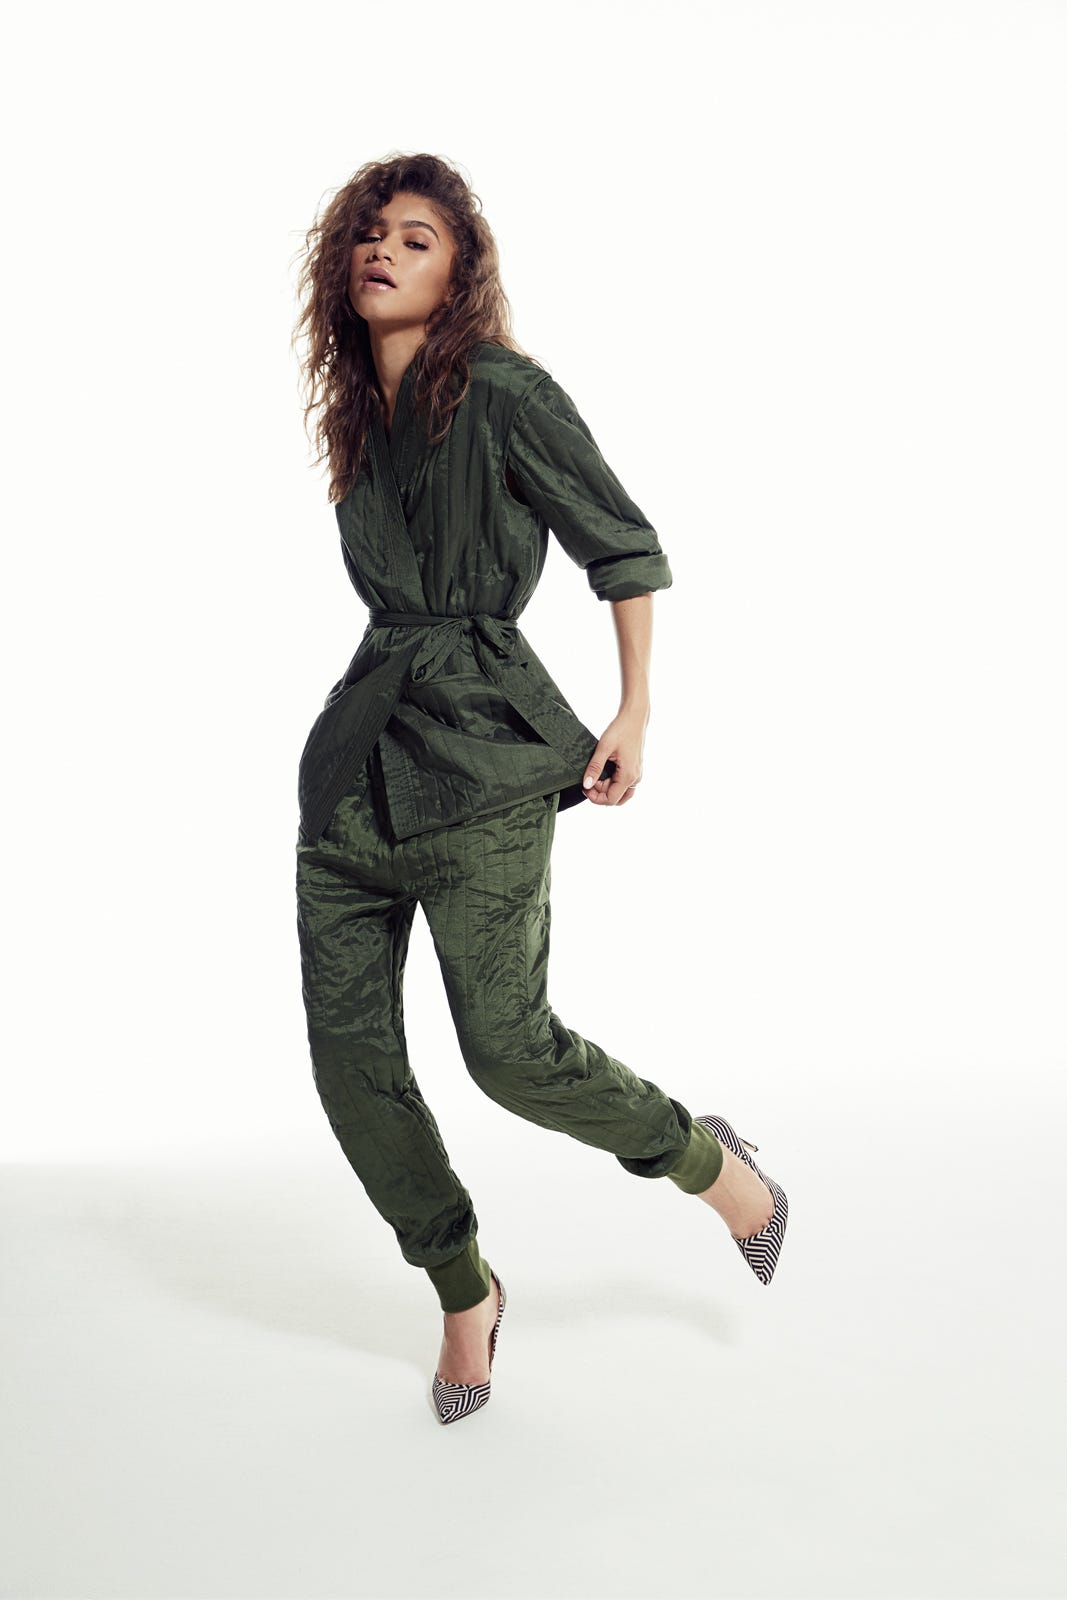 09b47e04b97b Daya By Zendaya Clothing Line Plus Size Affordable